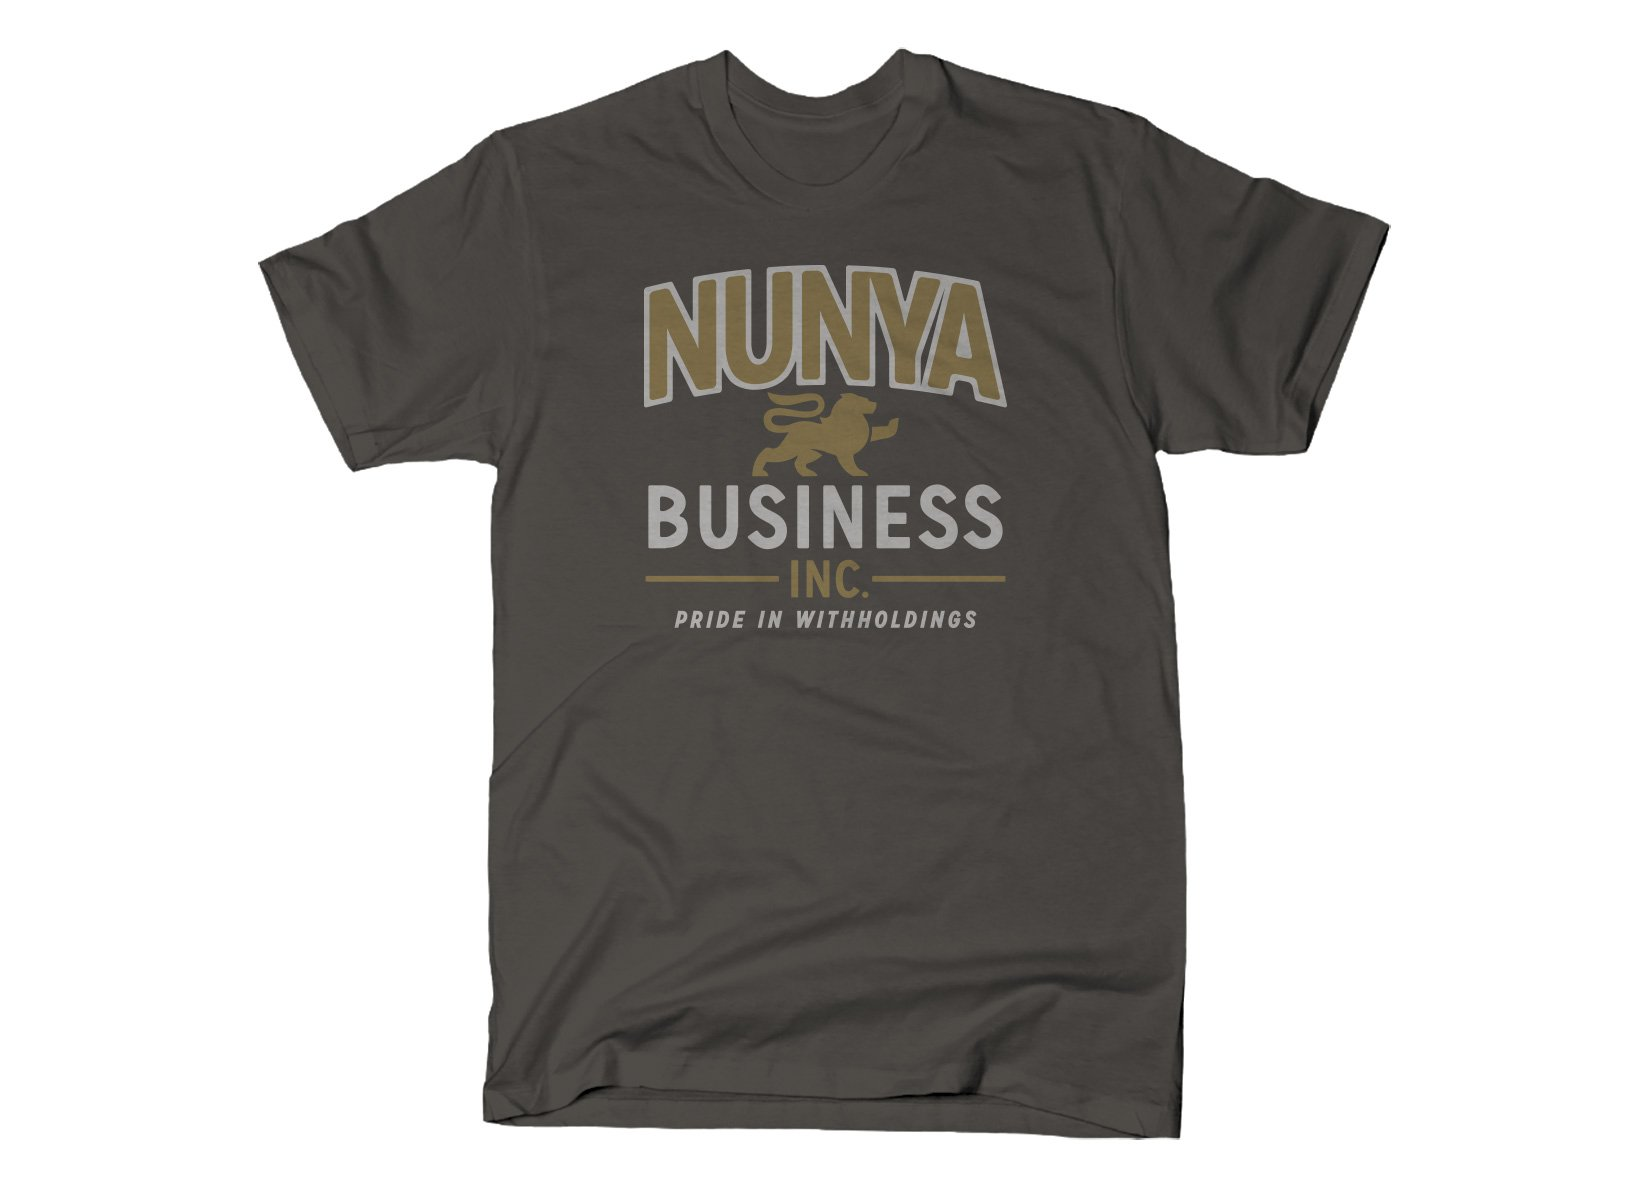 Nunya Business